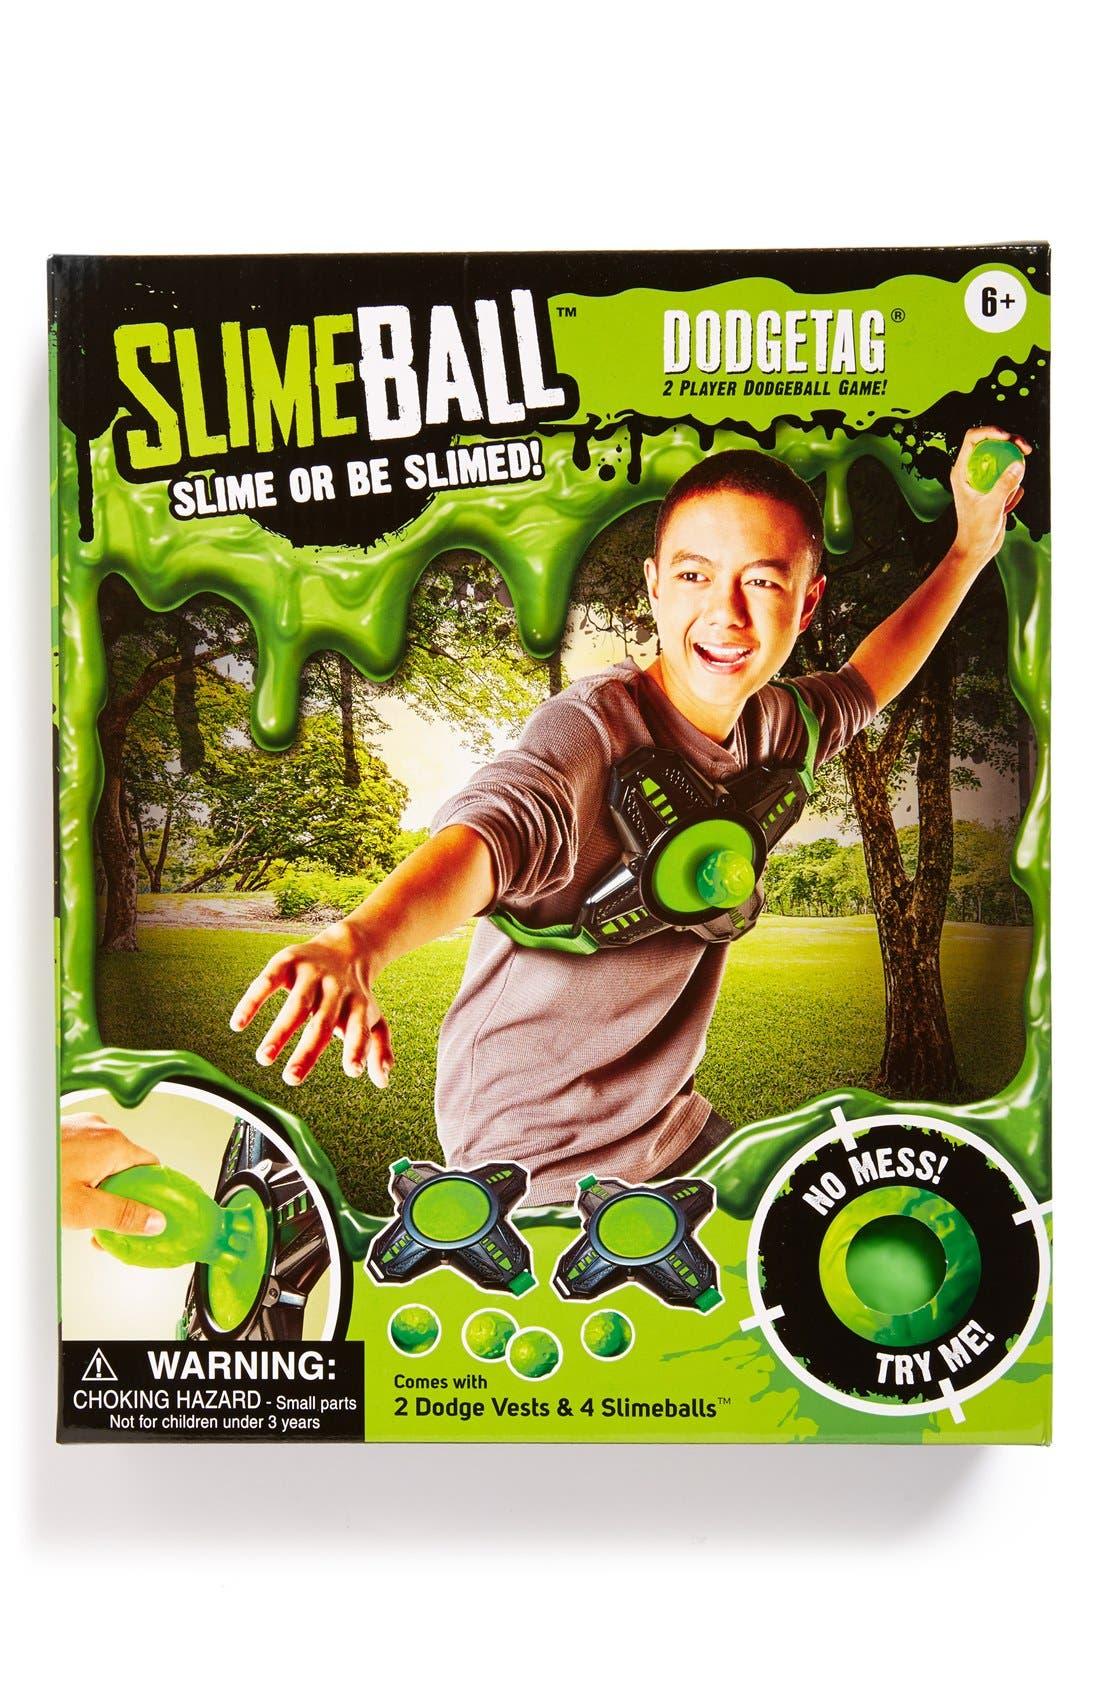 Alternate Image 1 Selected - Diggin'Slimeball' Dodgetag®